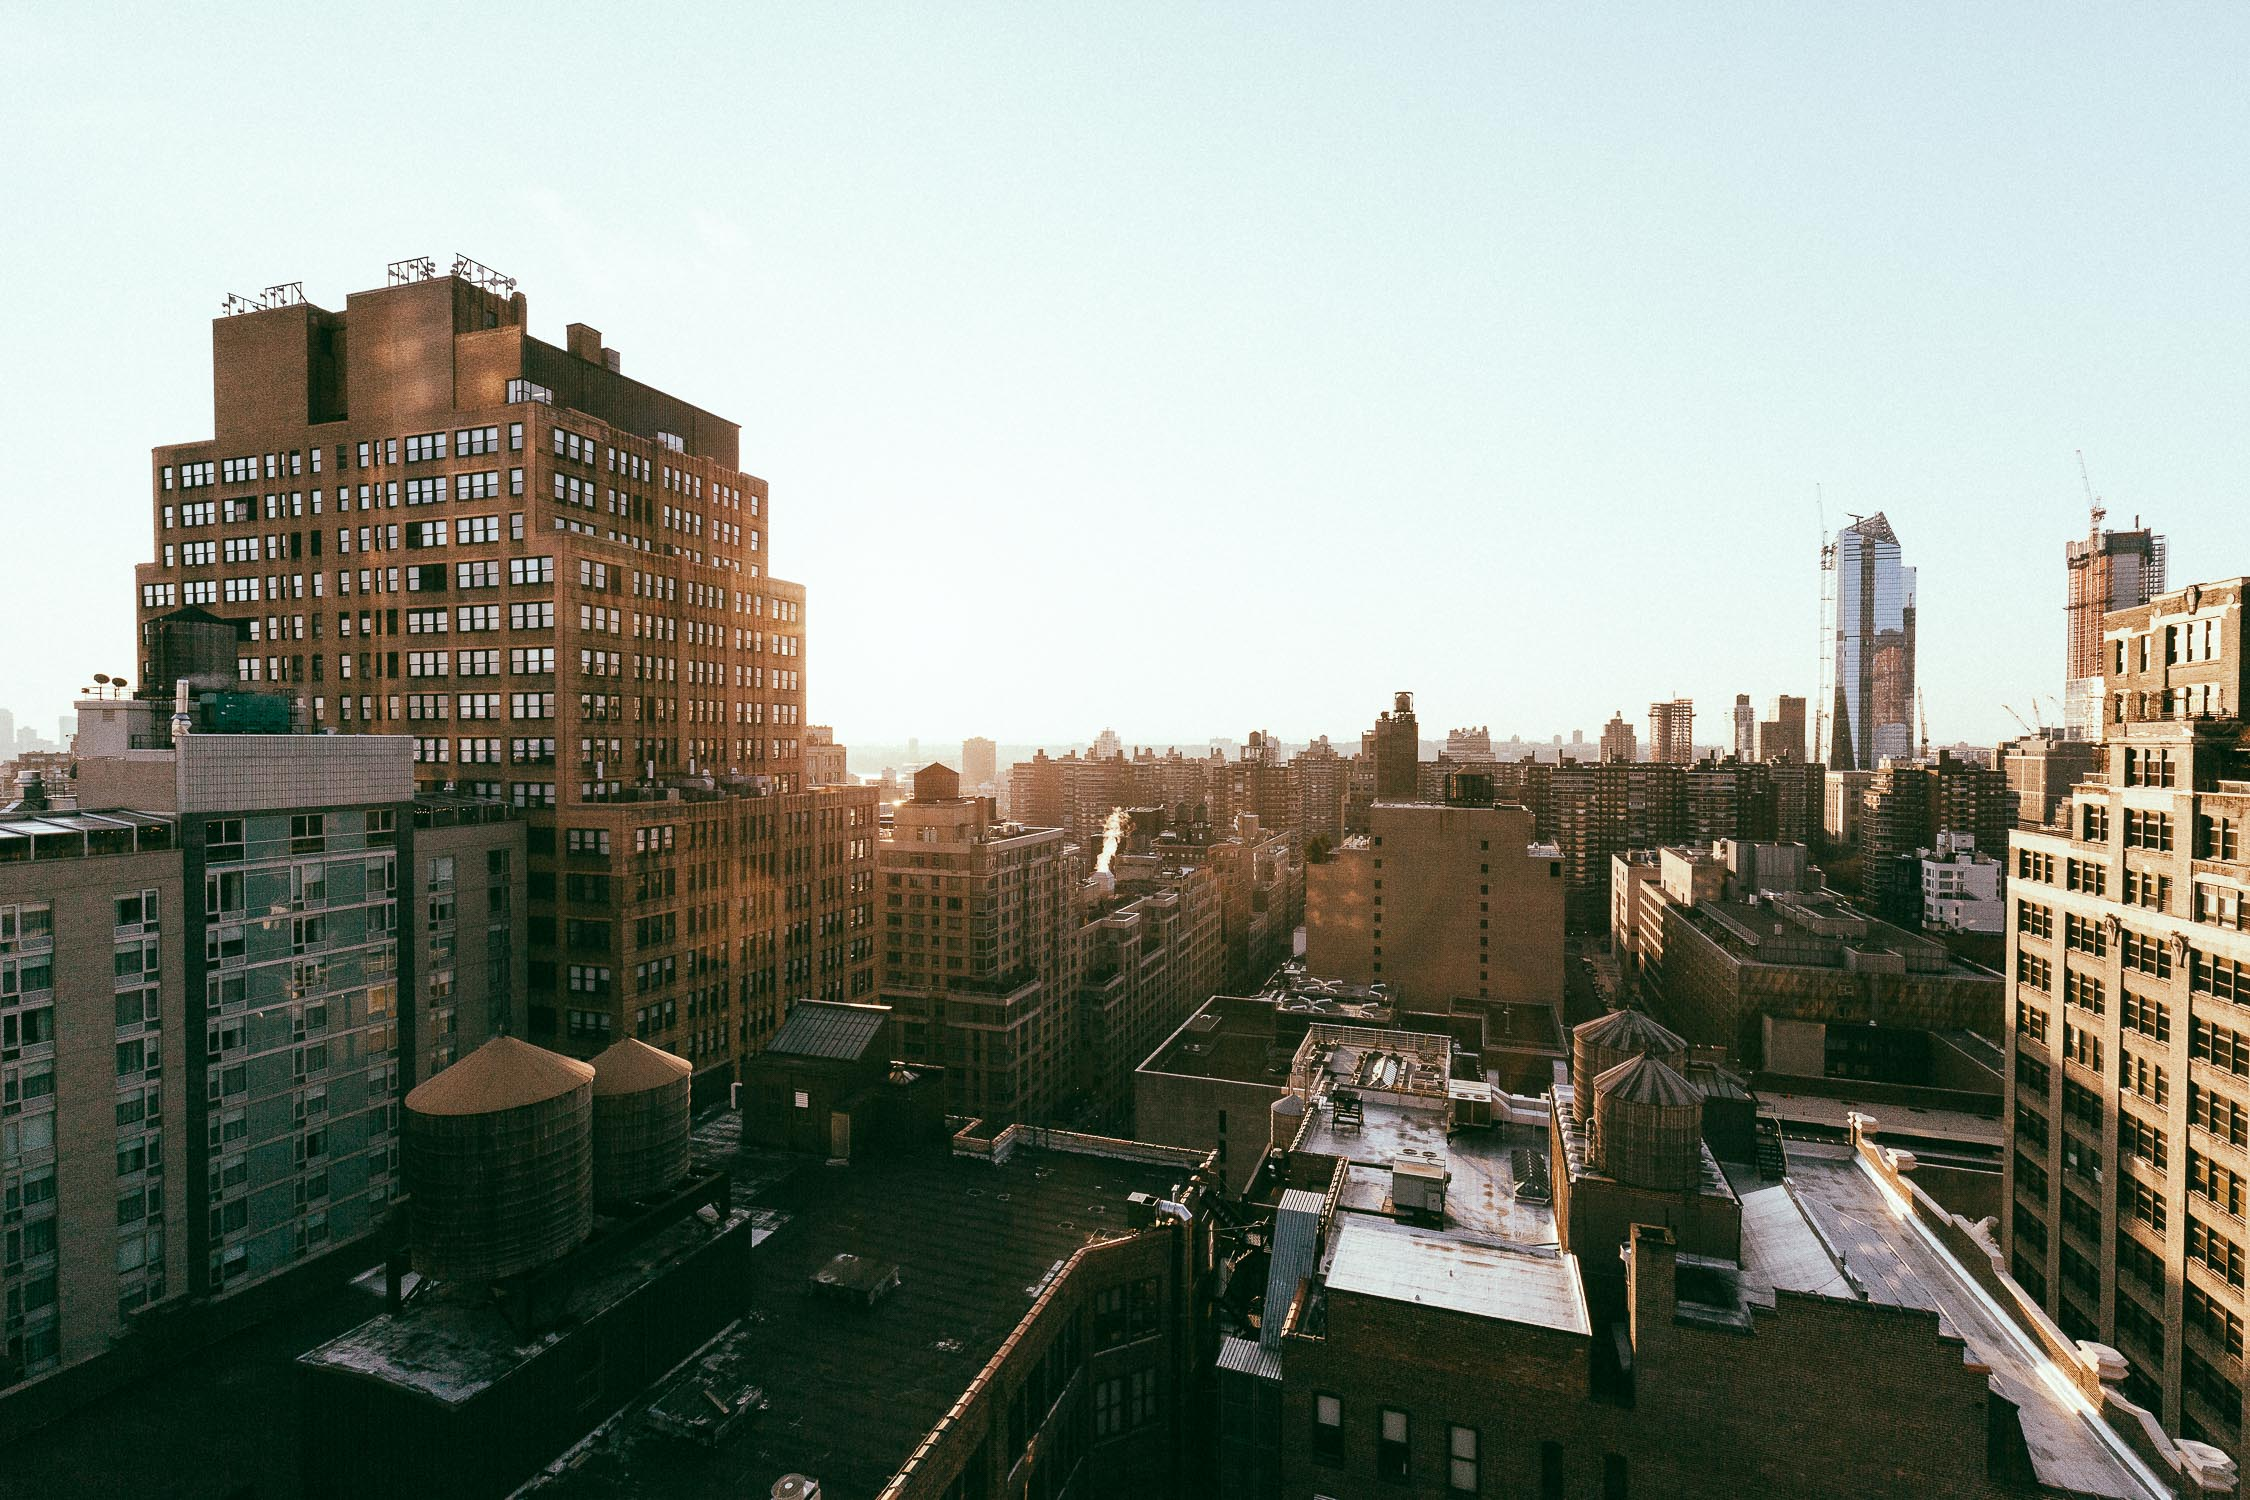 New York Manhattan sunset wide angle